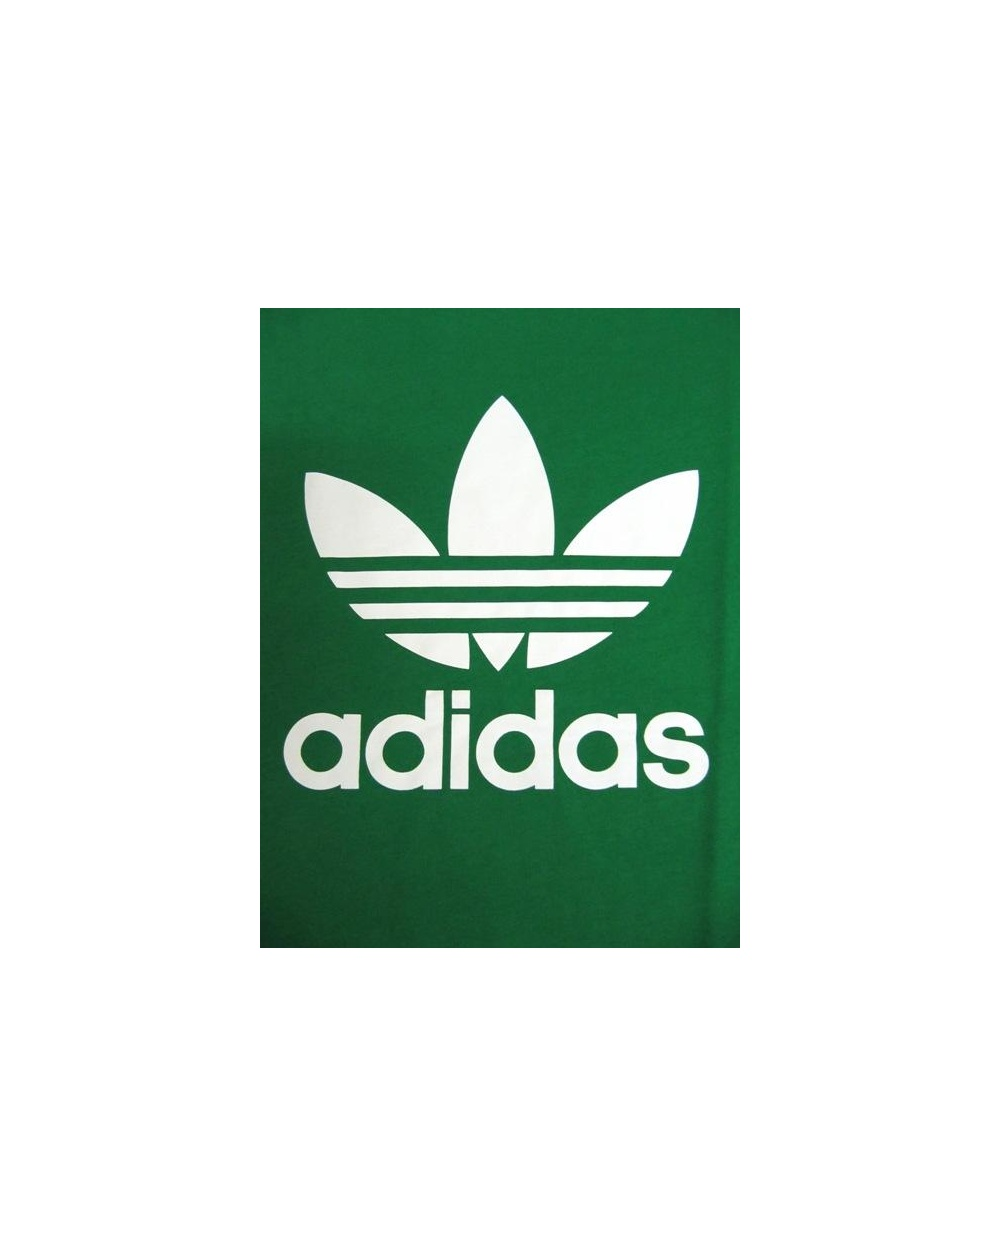 Green Adidas Logos